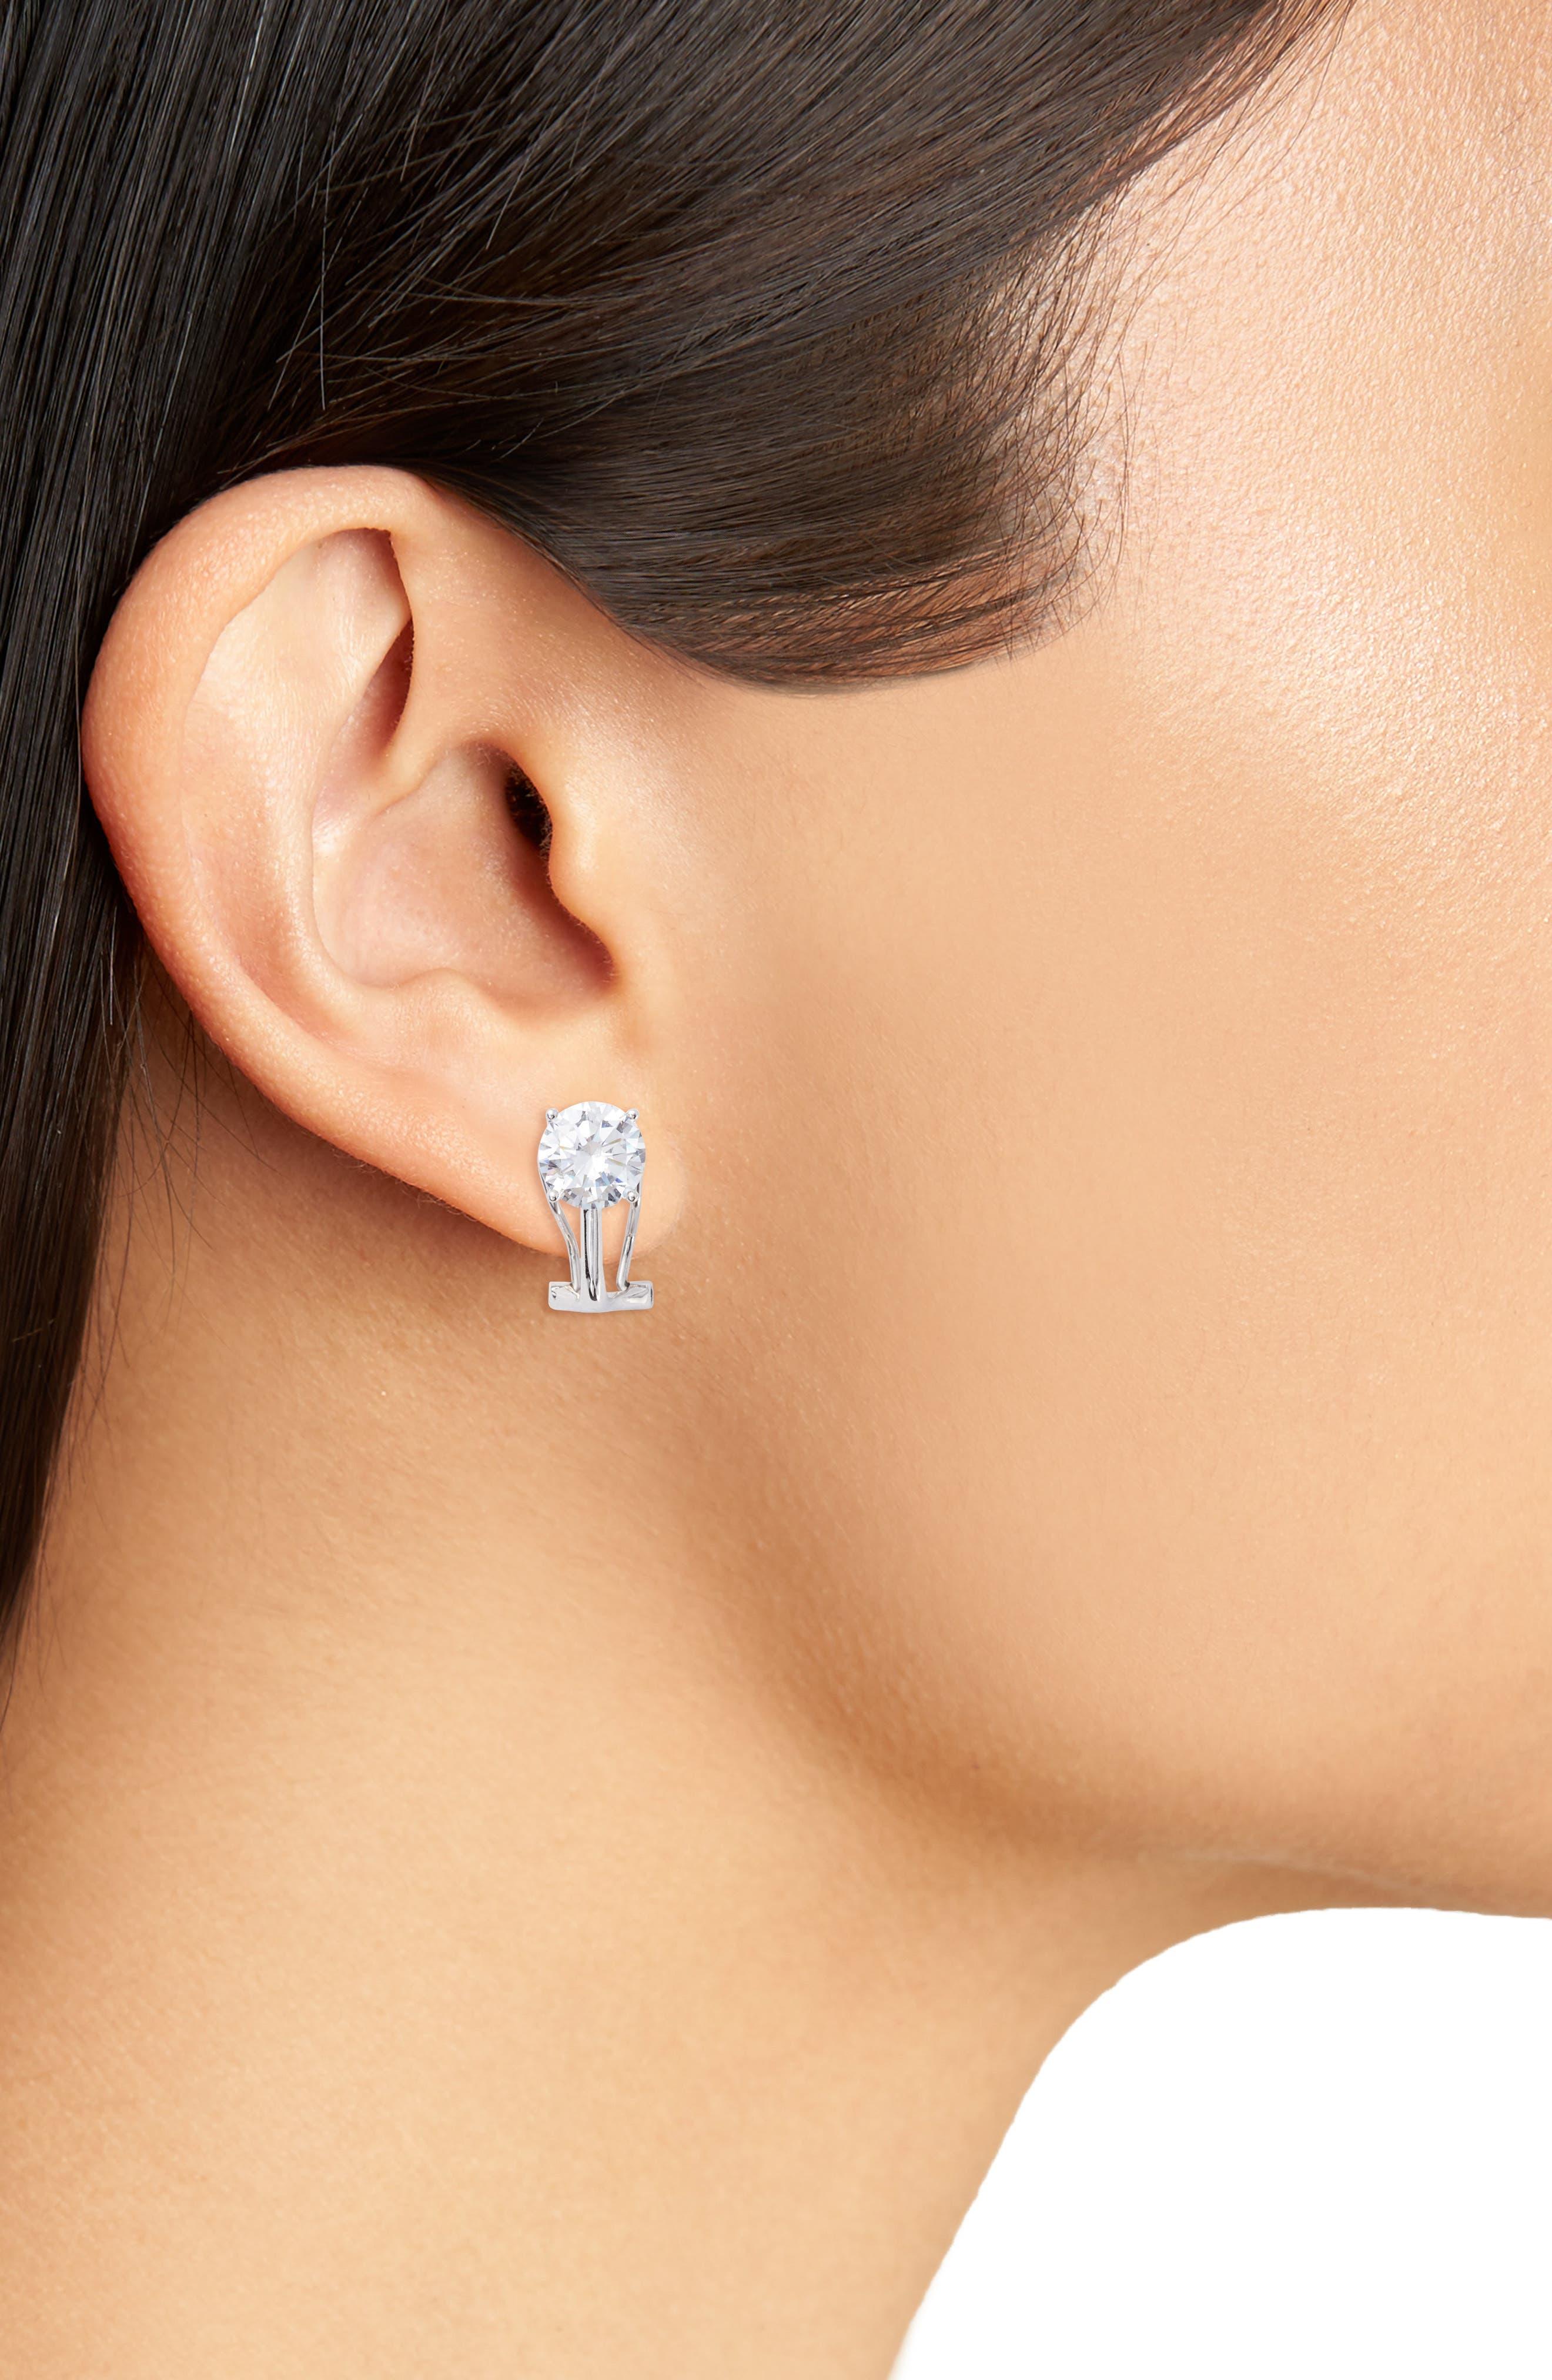 Clip-On Stud Earrings,                             Alternate thumbnail 2, color,                             SILVER